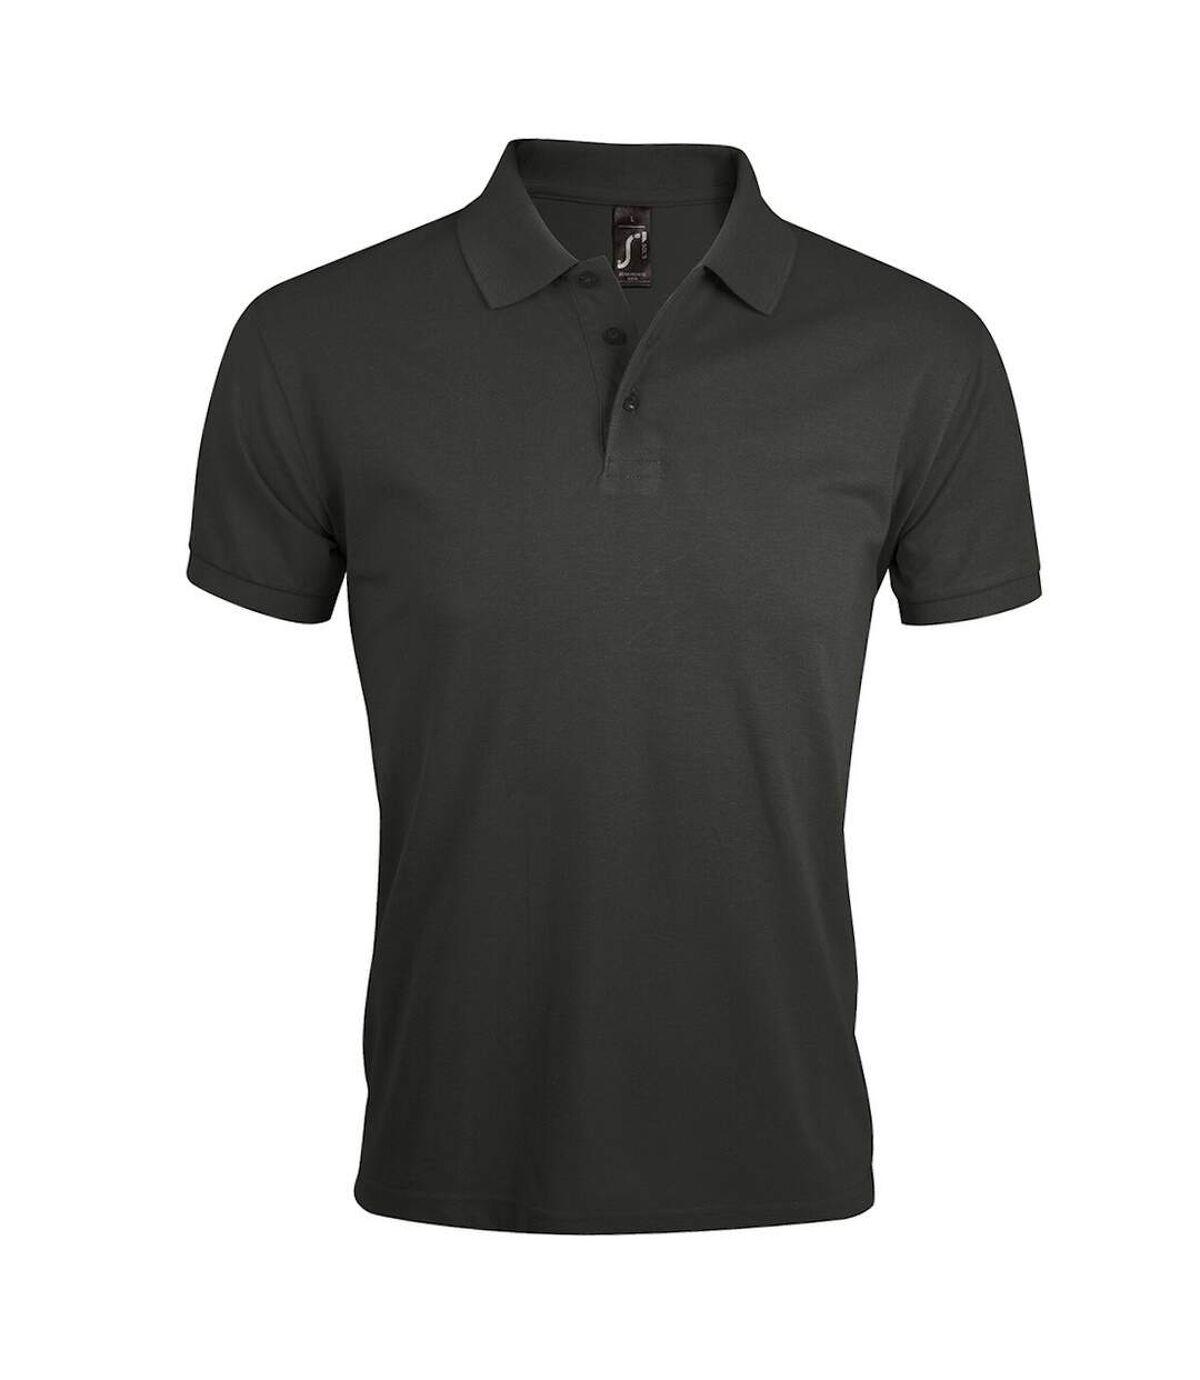 SOLs Mens Prime Pique Plain Short Sleeve Polo Shirt (Dark Grey) - UTPC493